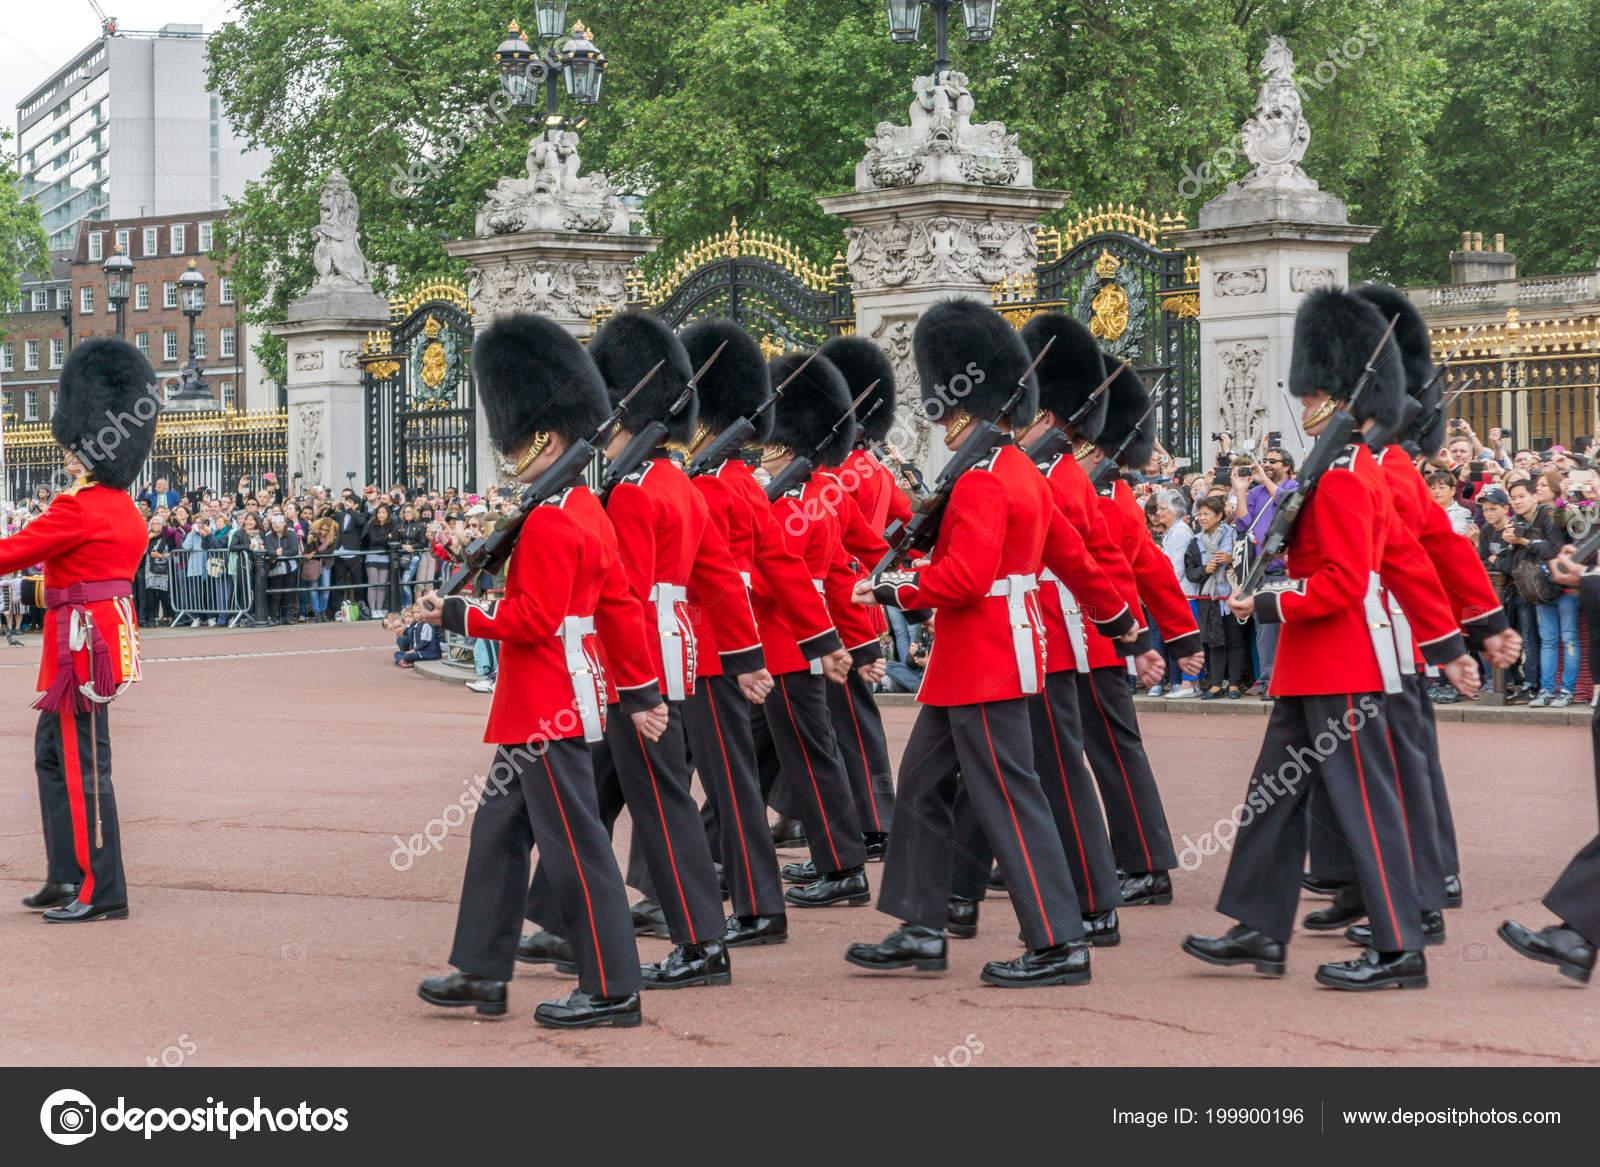 London England June 2016 British Royal Guards Perform